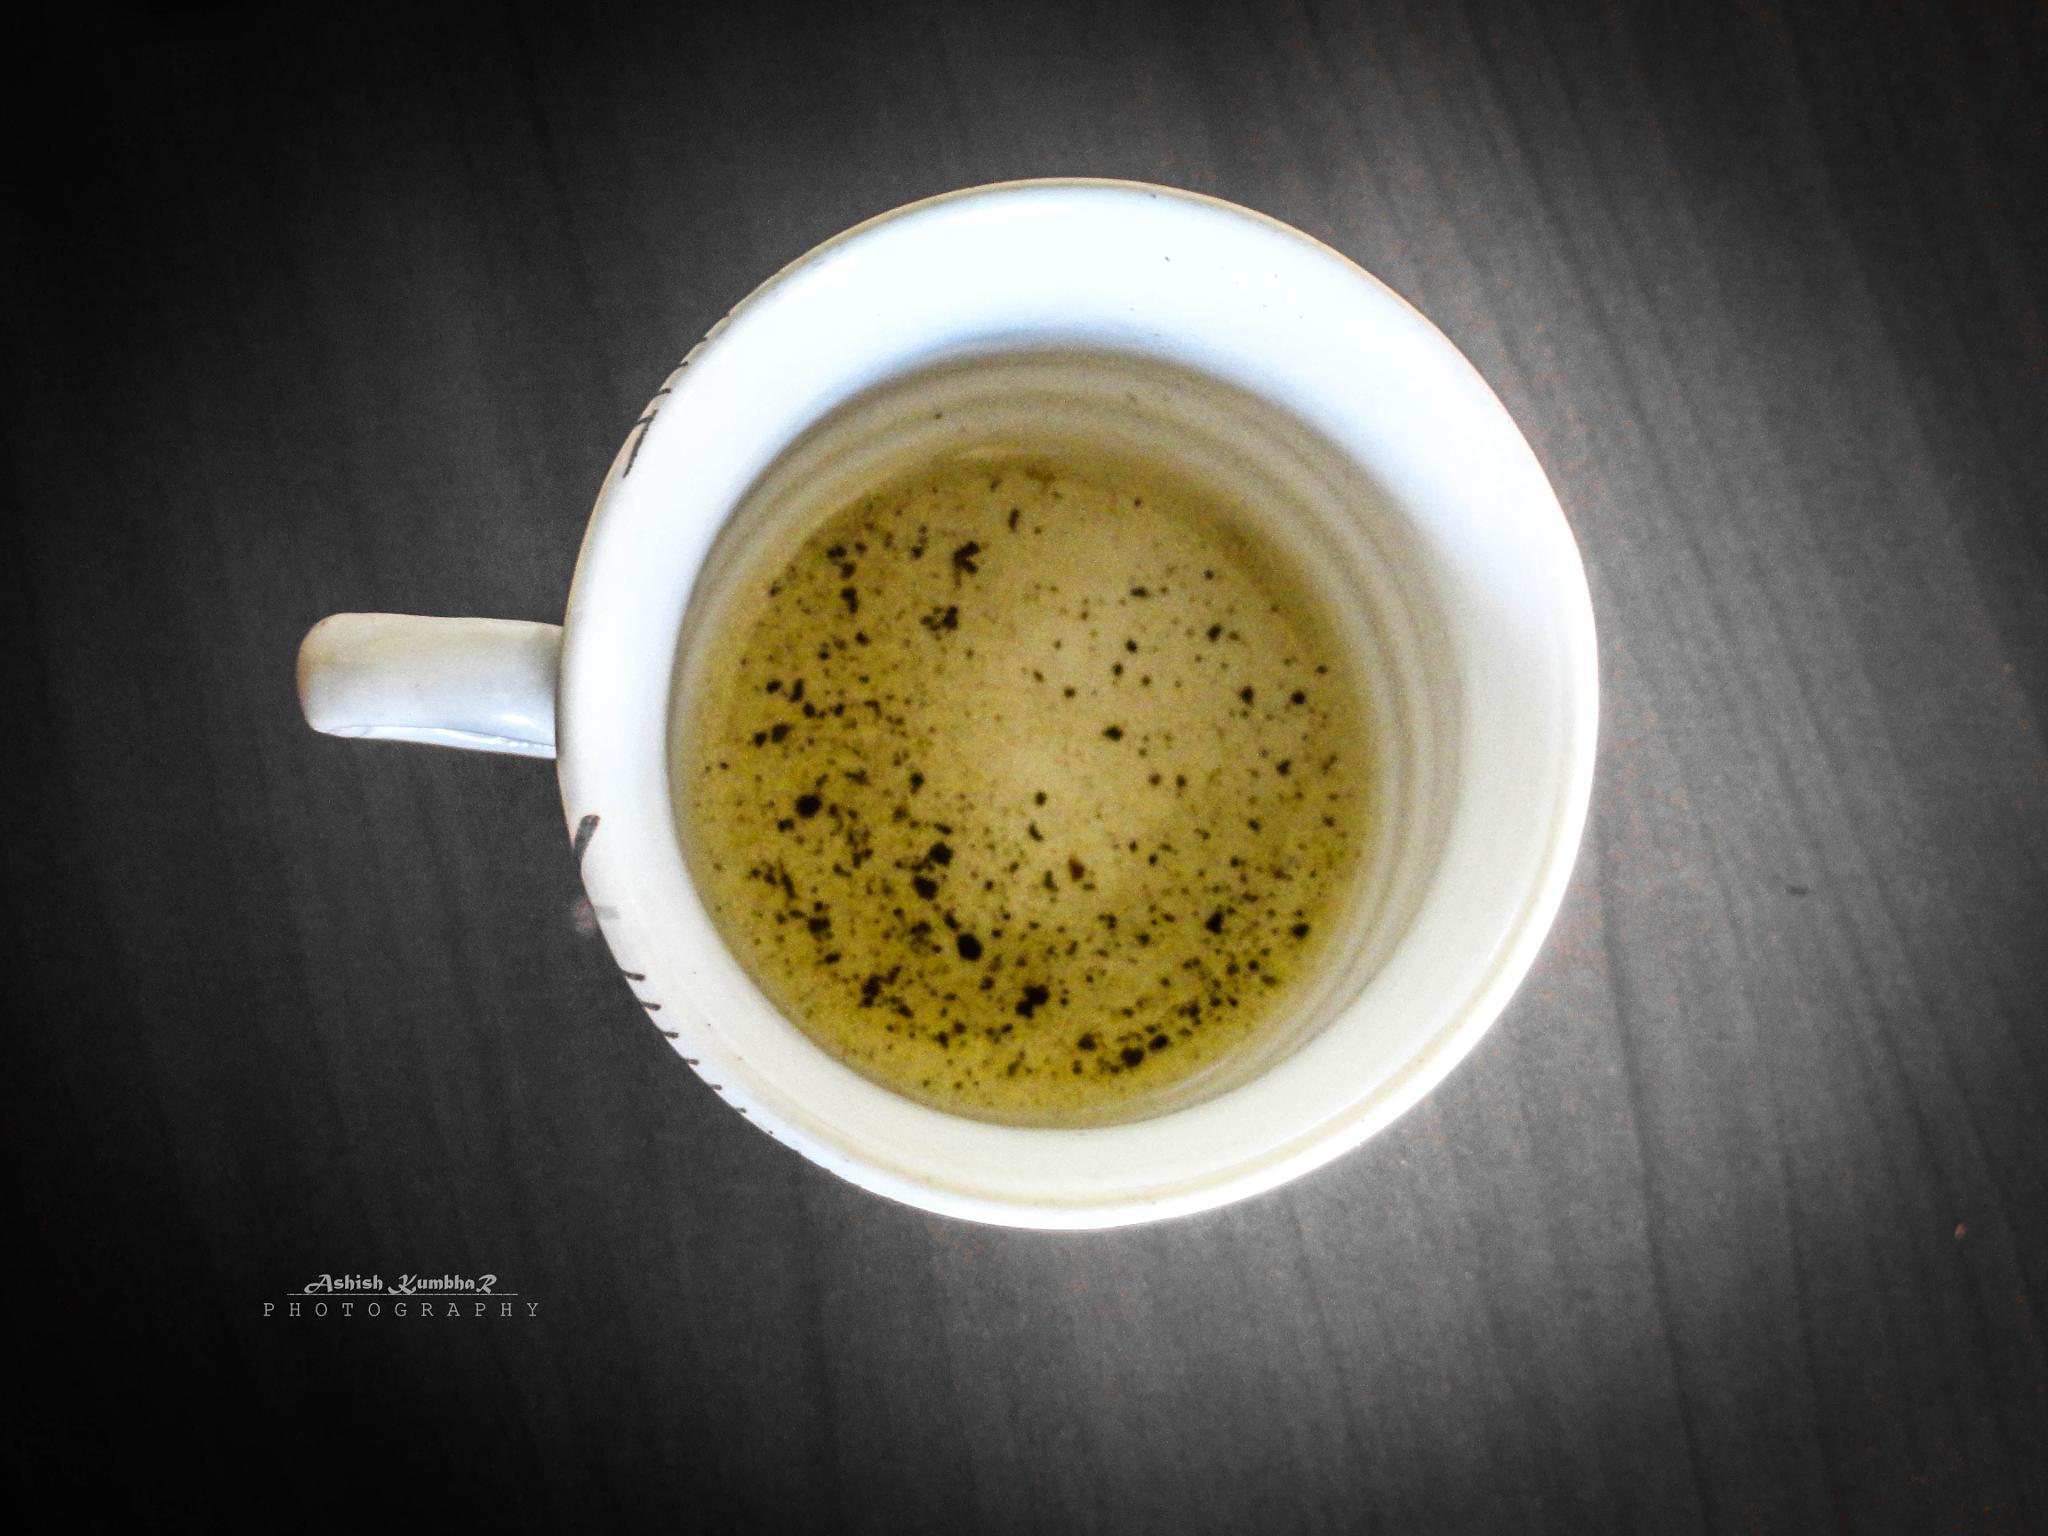 Cup by Ashish Kumbhar